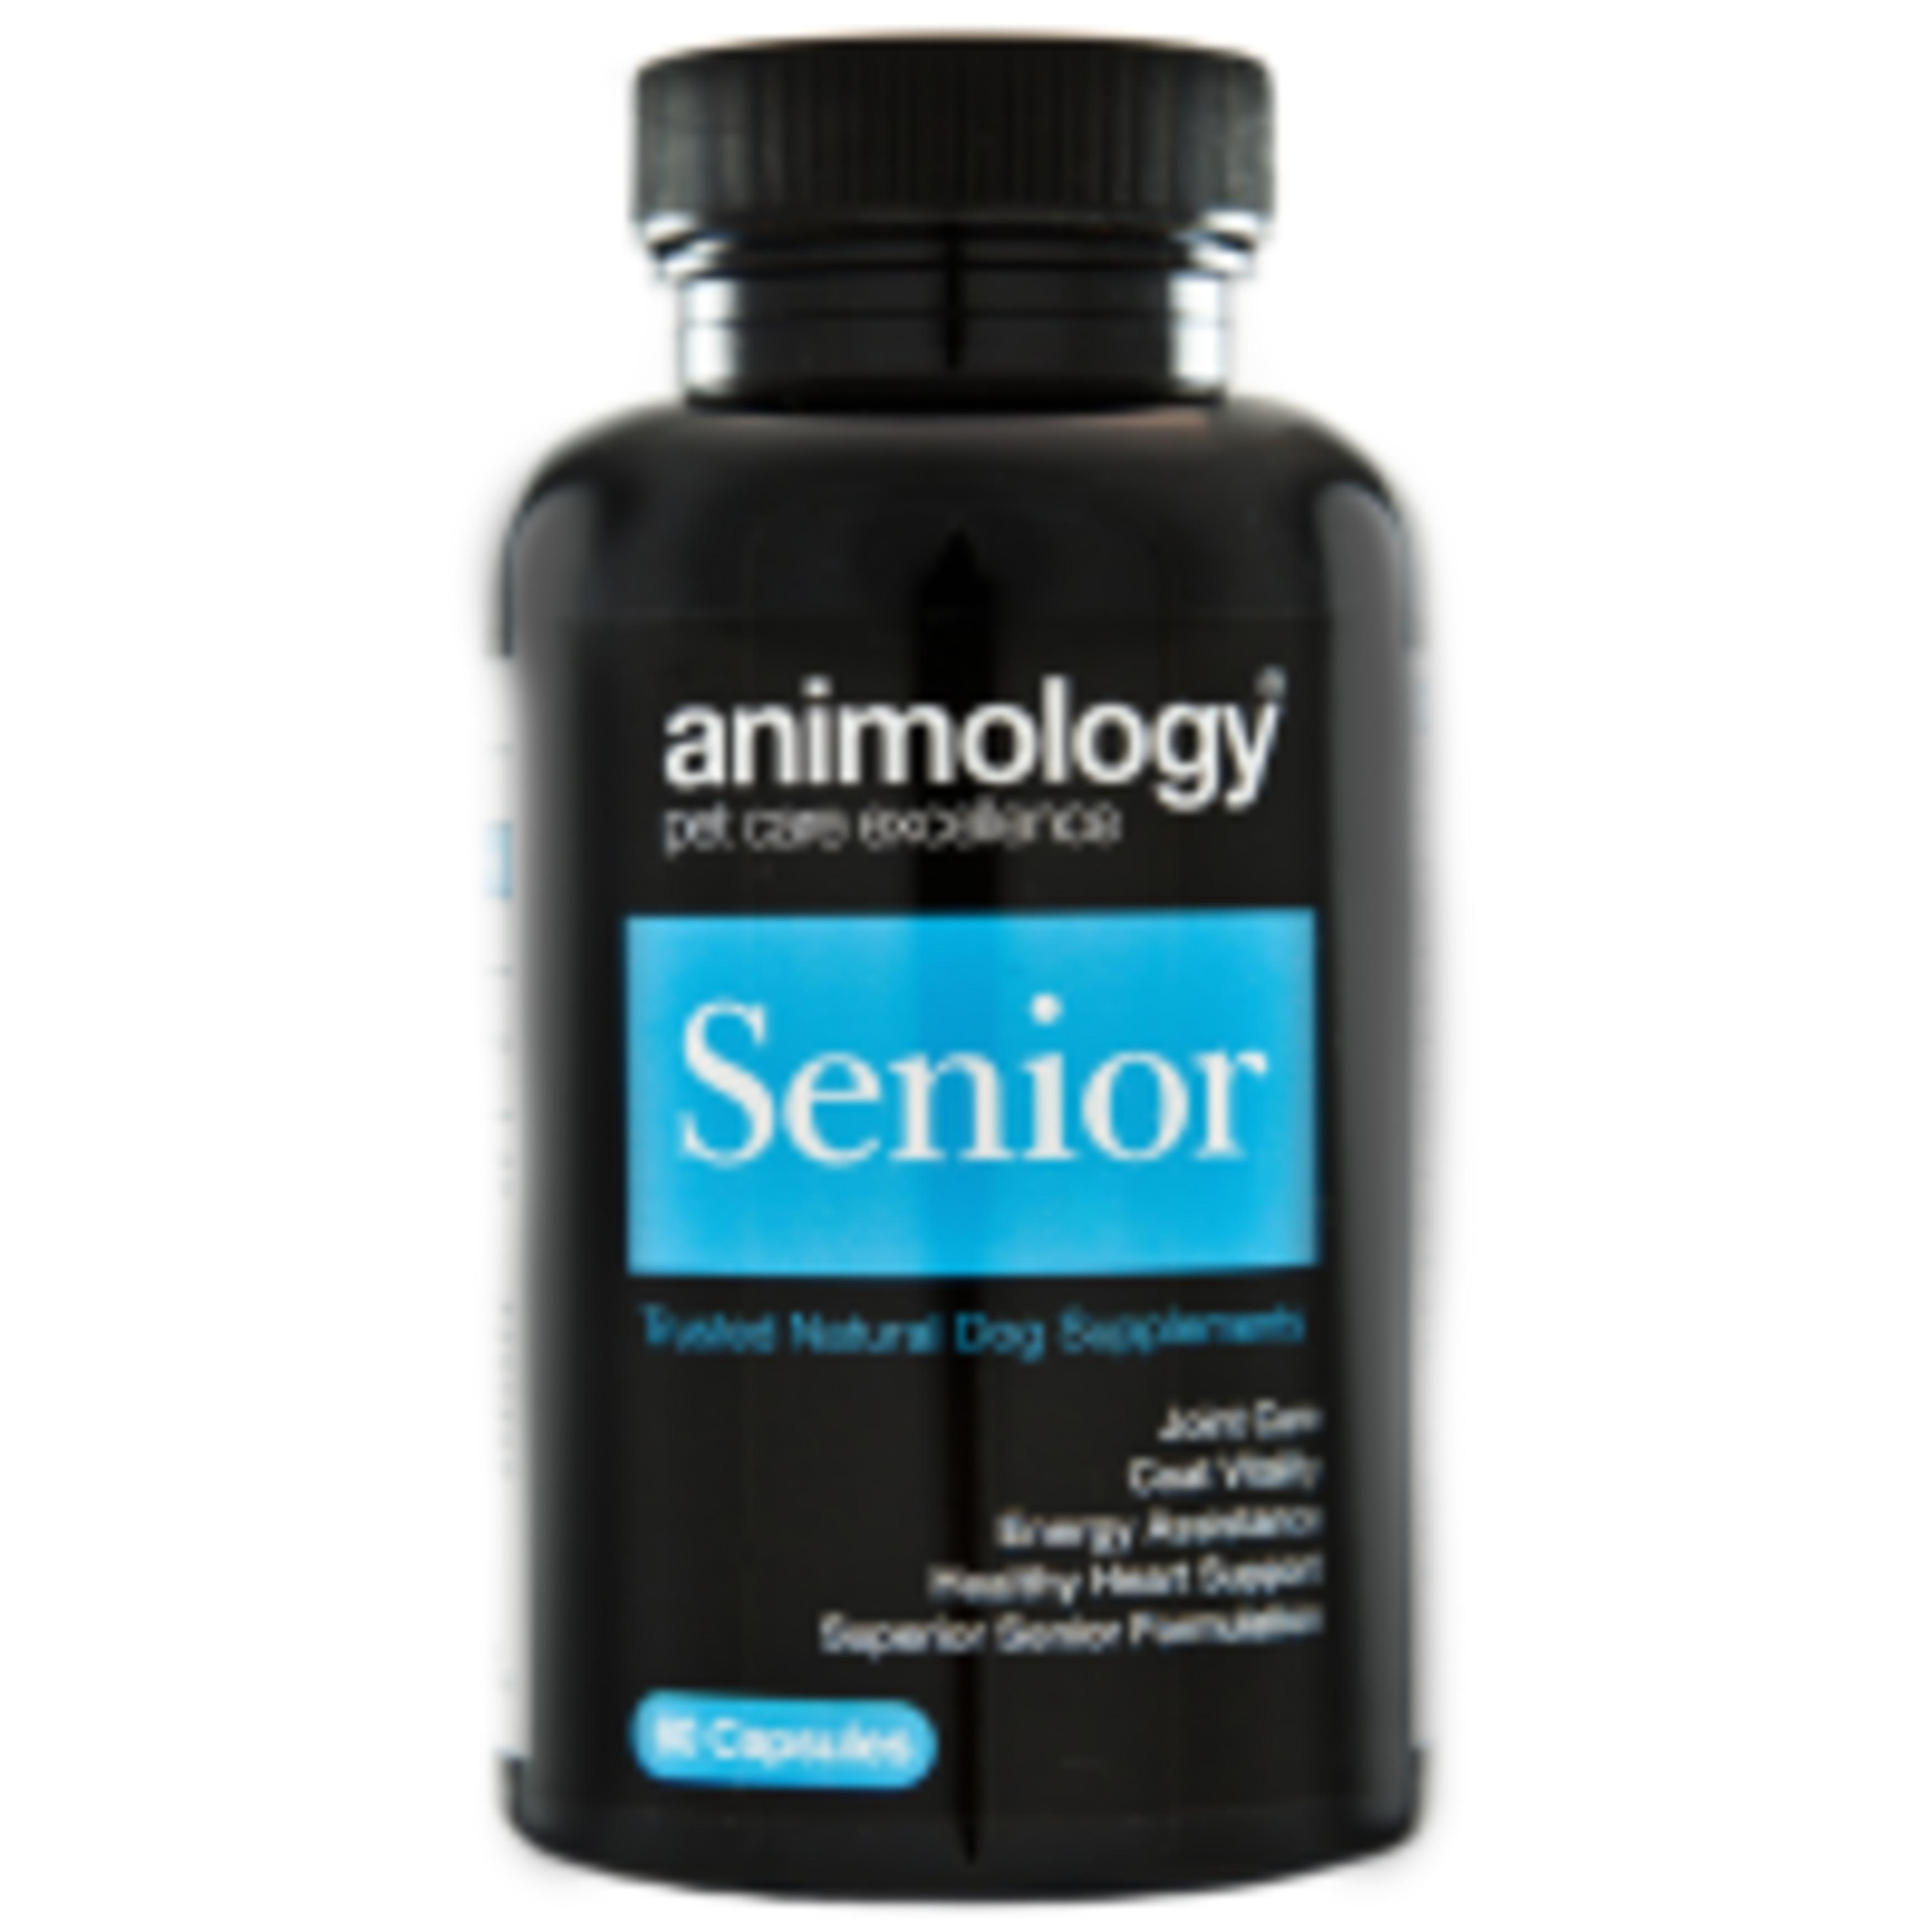 Animology Senior 60 Tabs 60 Tablets